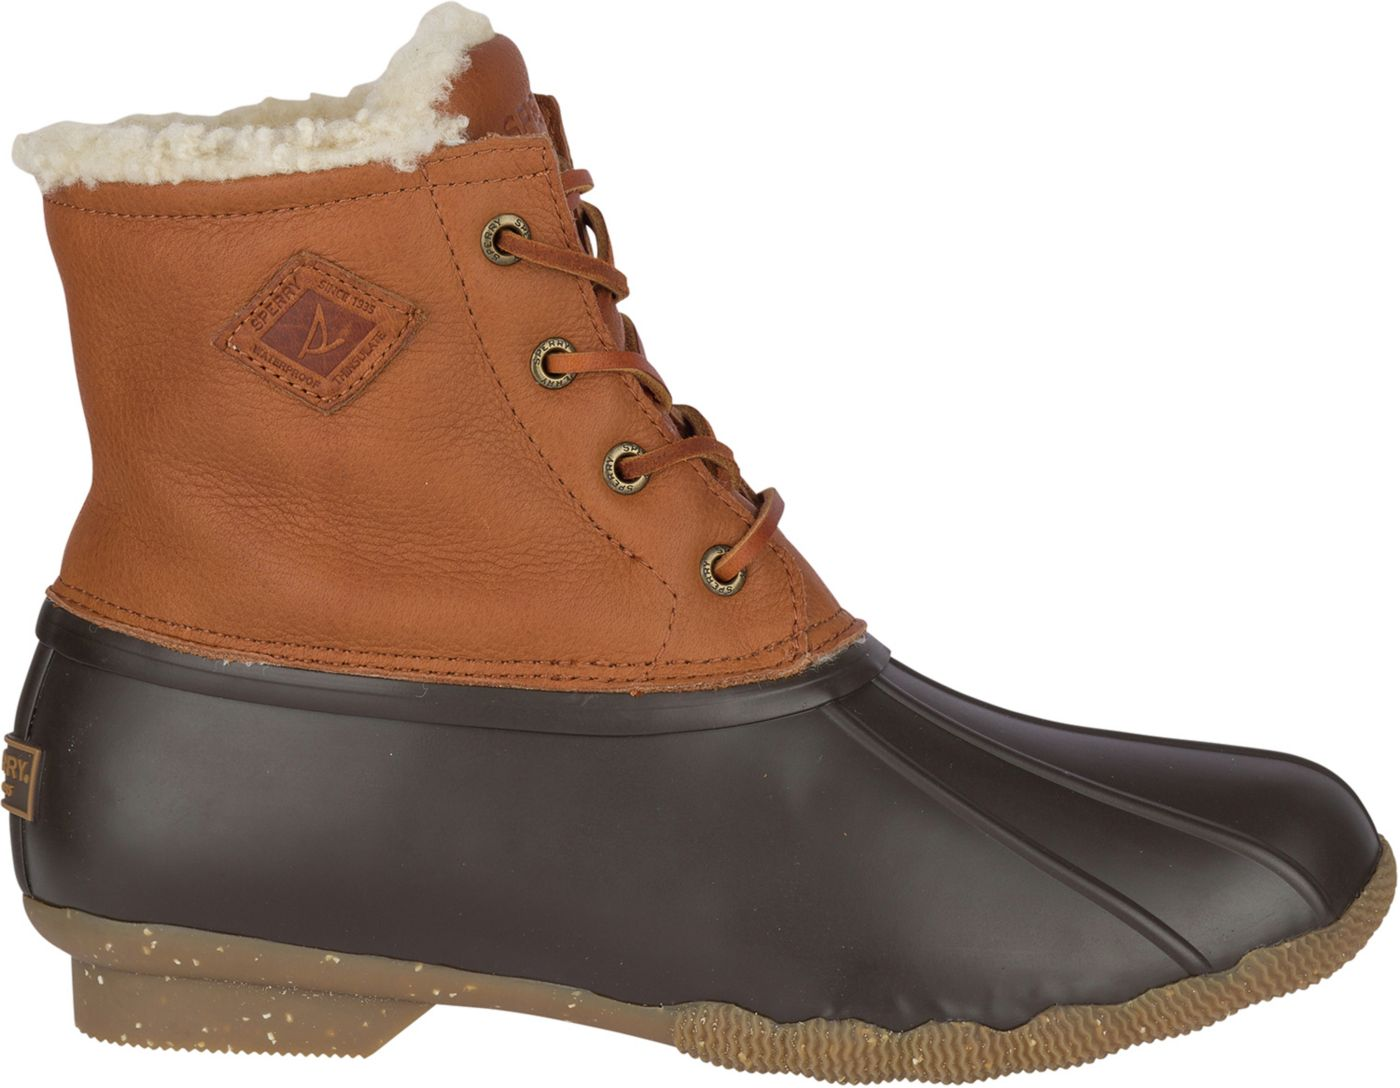 Sperry Women's Saltwater Winter Lux 200g Waterproof Winter Boots